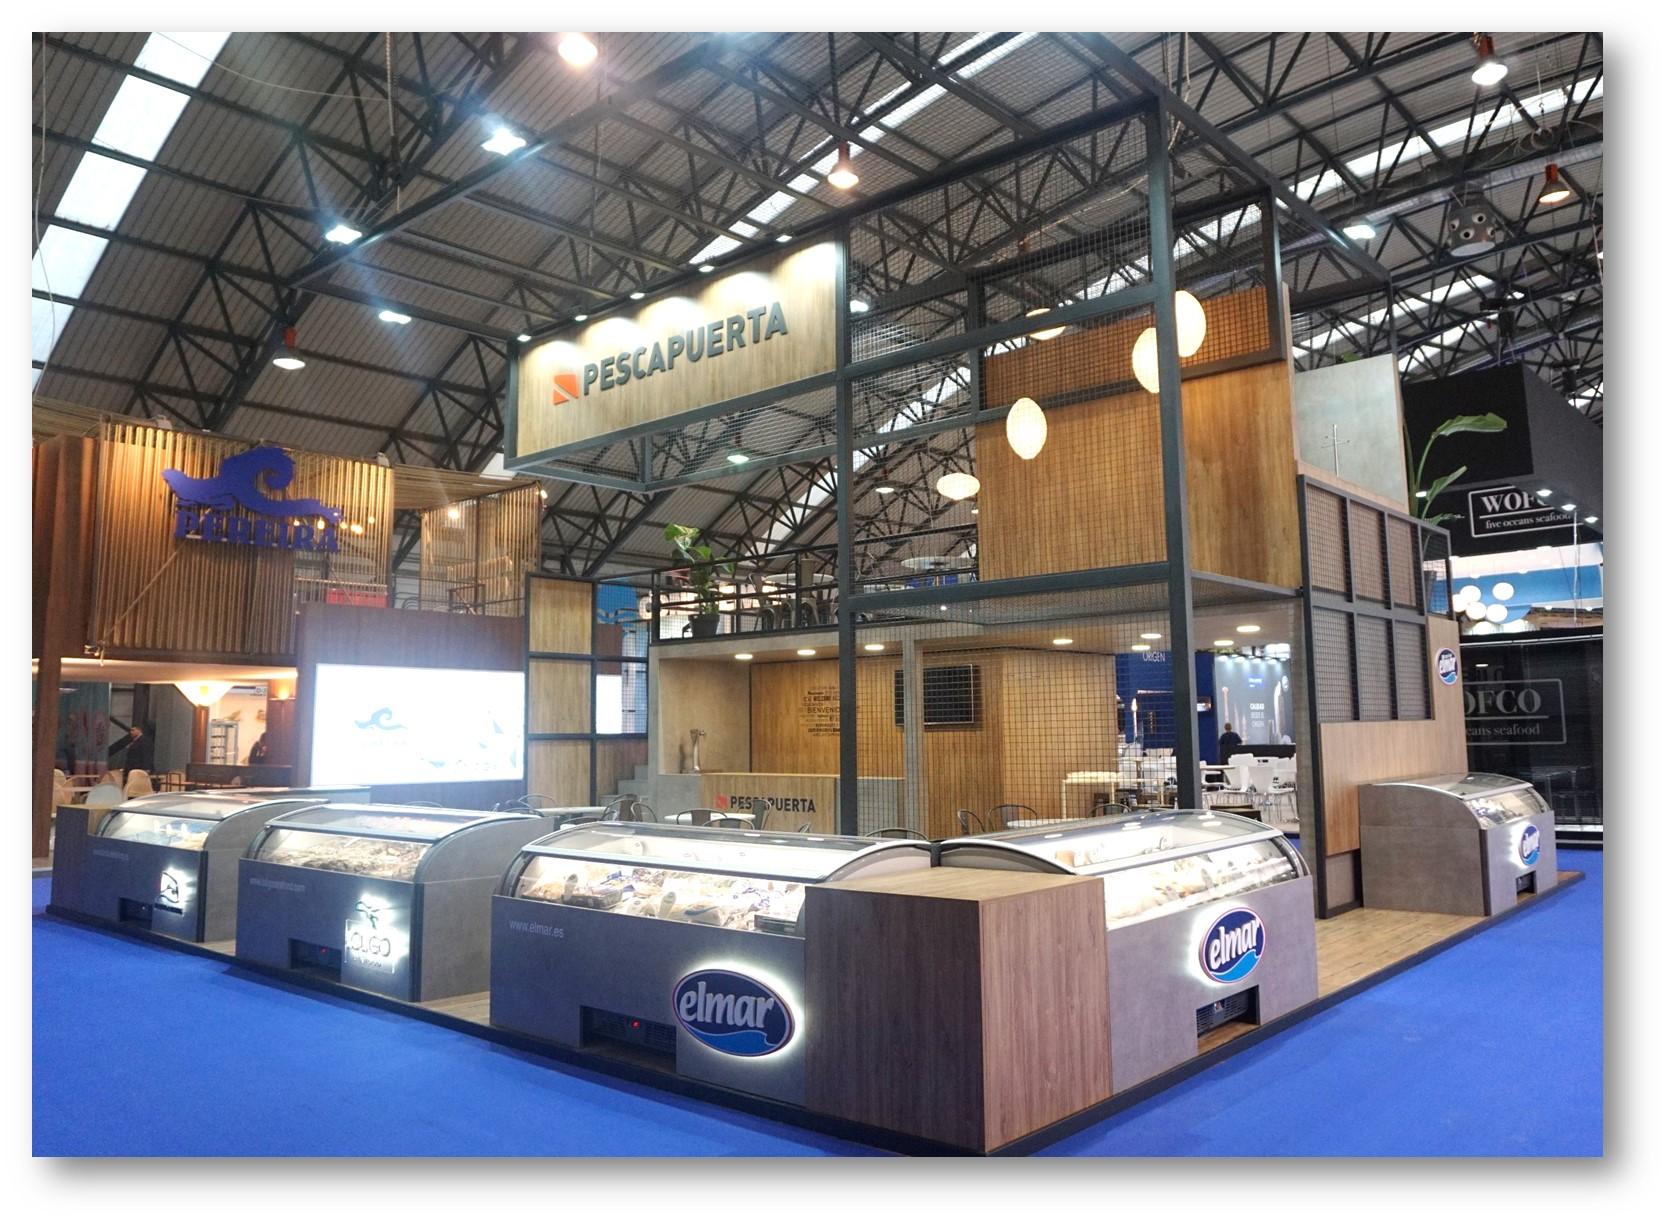 Pescapuerta attends the Conxemar Fair 2017